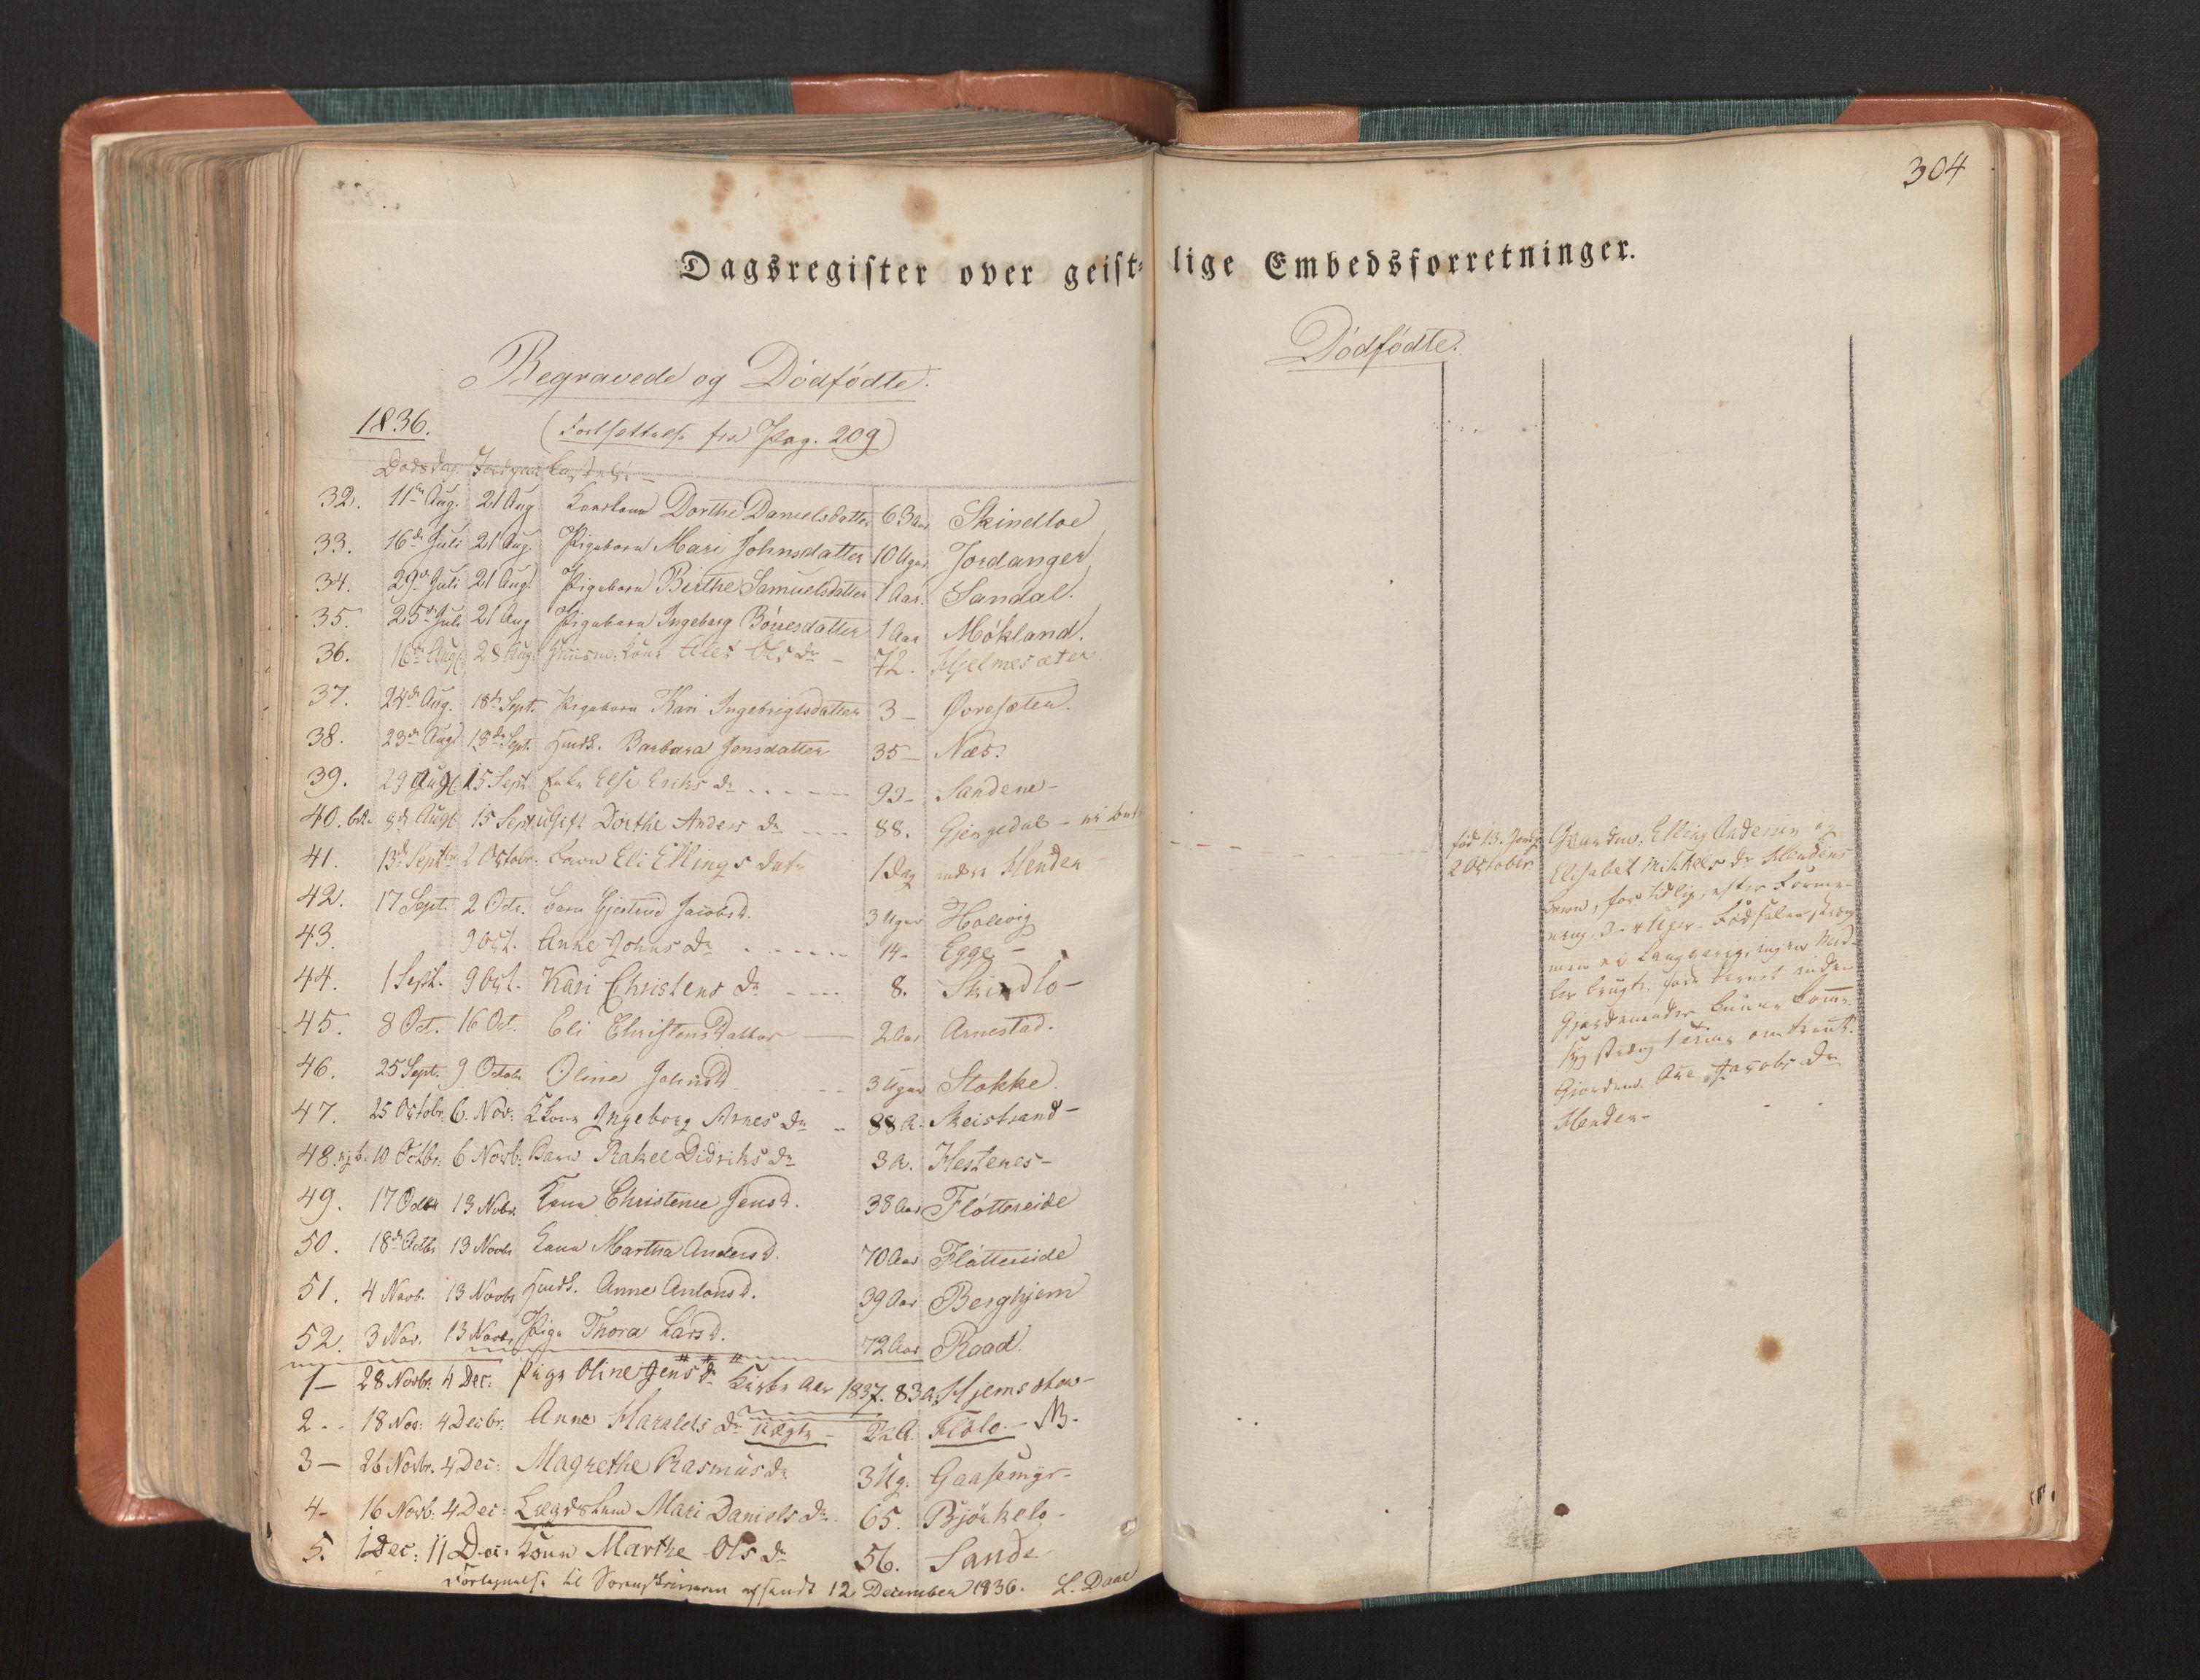 SAB, Gloppen sokneprestembete, H/Haa/Haaa/L0007: Ministerialbok nr. A 7, 1827-1837, s. 304